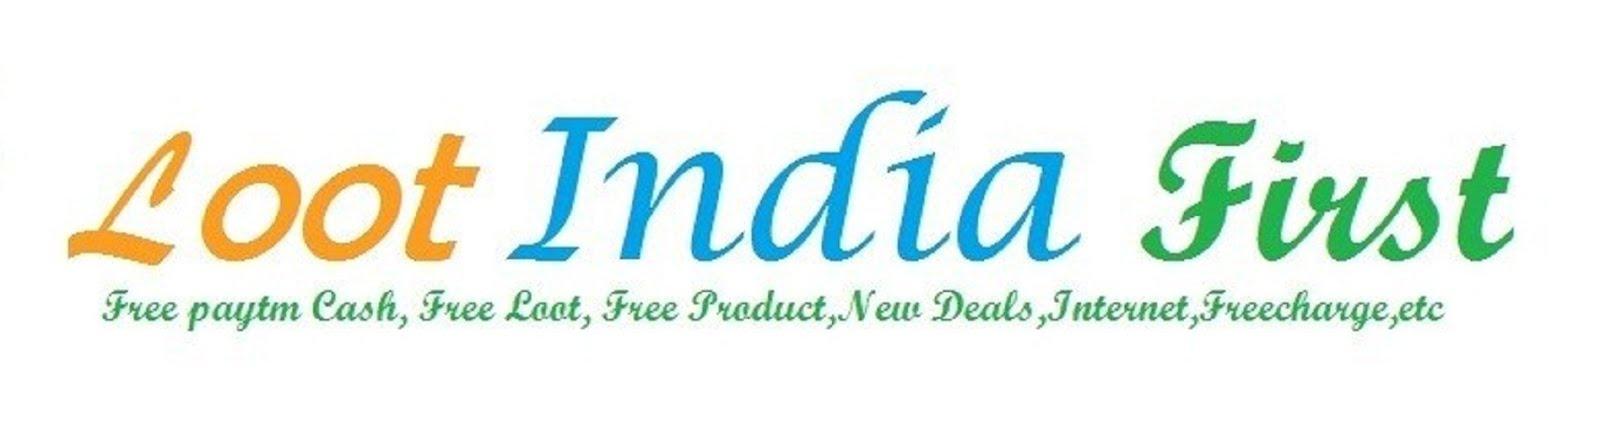 Freecharge - Airtel Free Recharge Tricks 2019 - Get ₹30